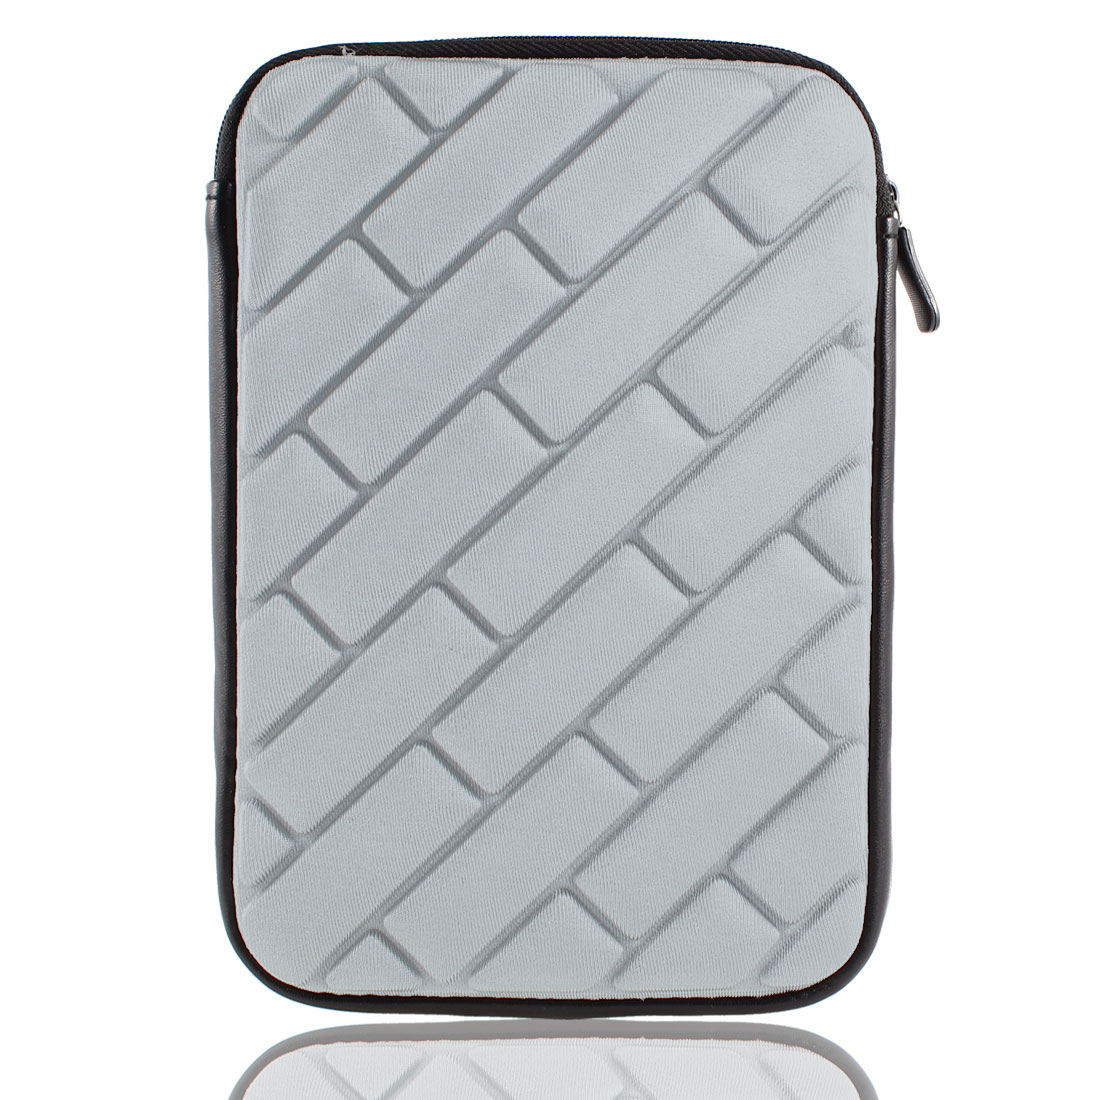 "7"" Shockproof Notebook Laptop Sleeve for Tablet PC,Ebook Reader Gray"